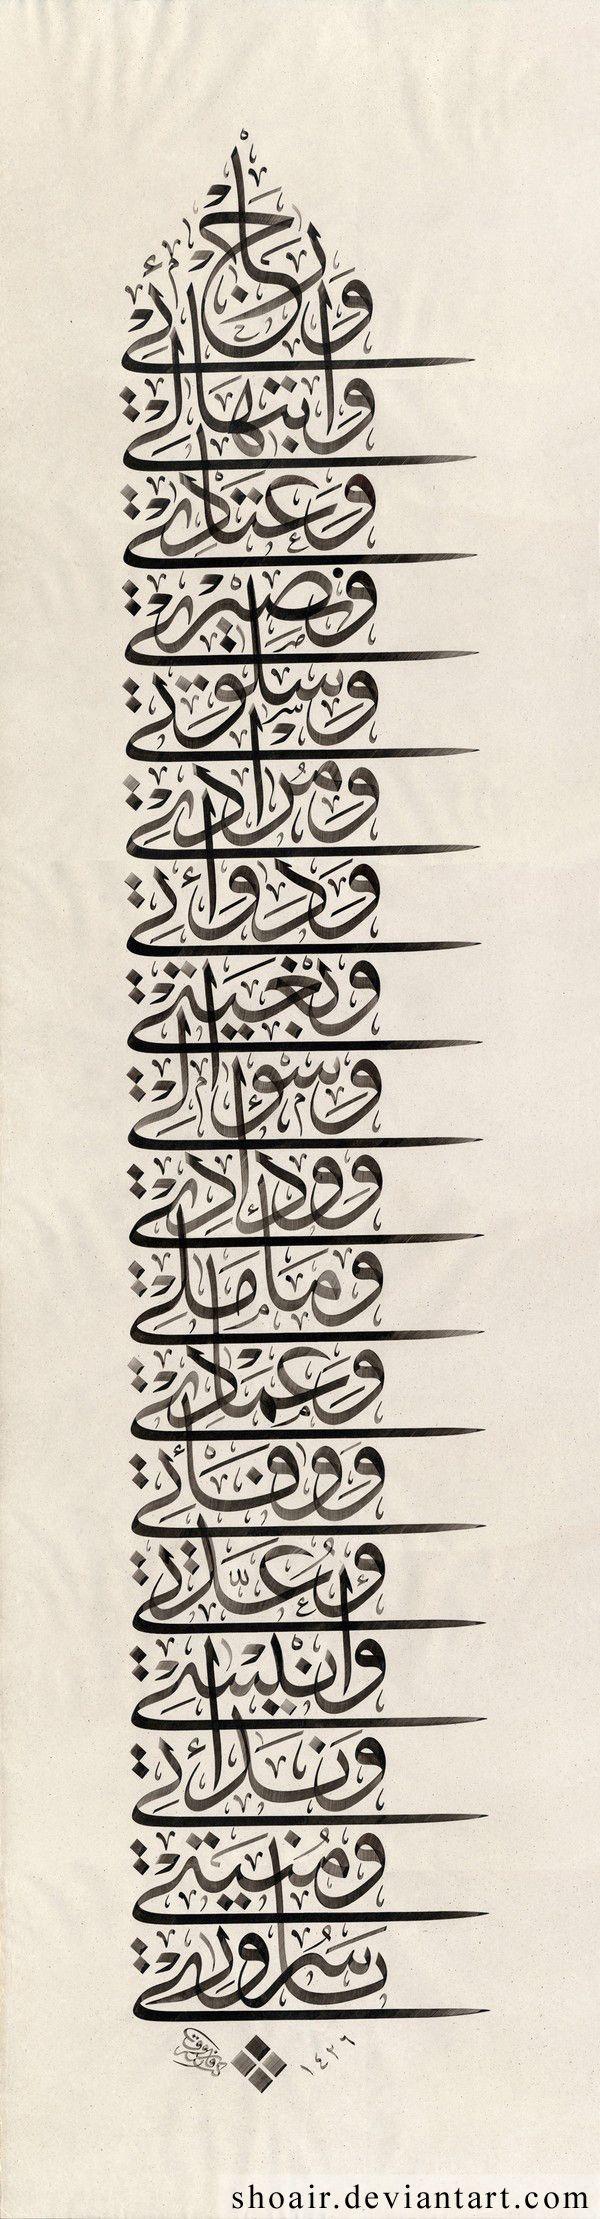 calligrapher Farouk Haddad 5 by ACalligraphy.deviantart.com on @deviantART